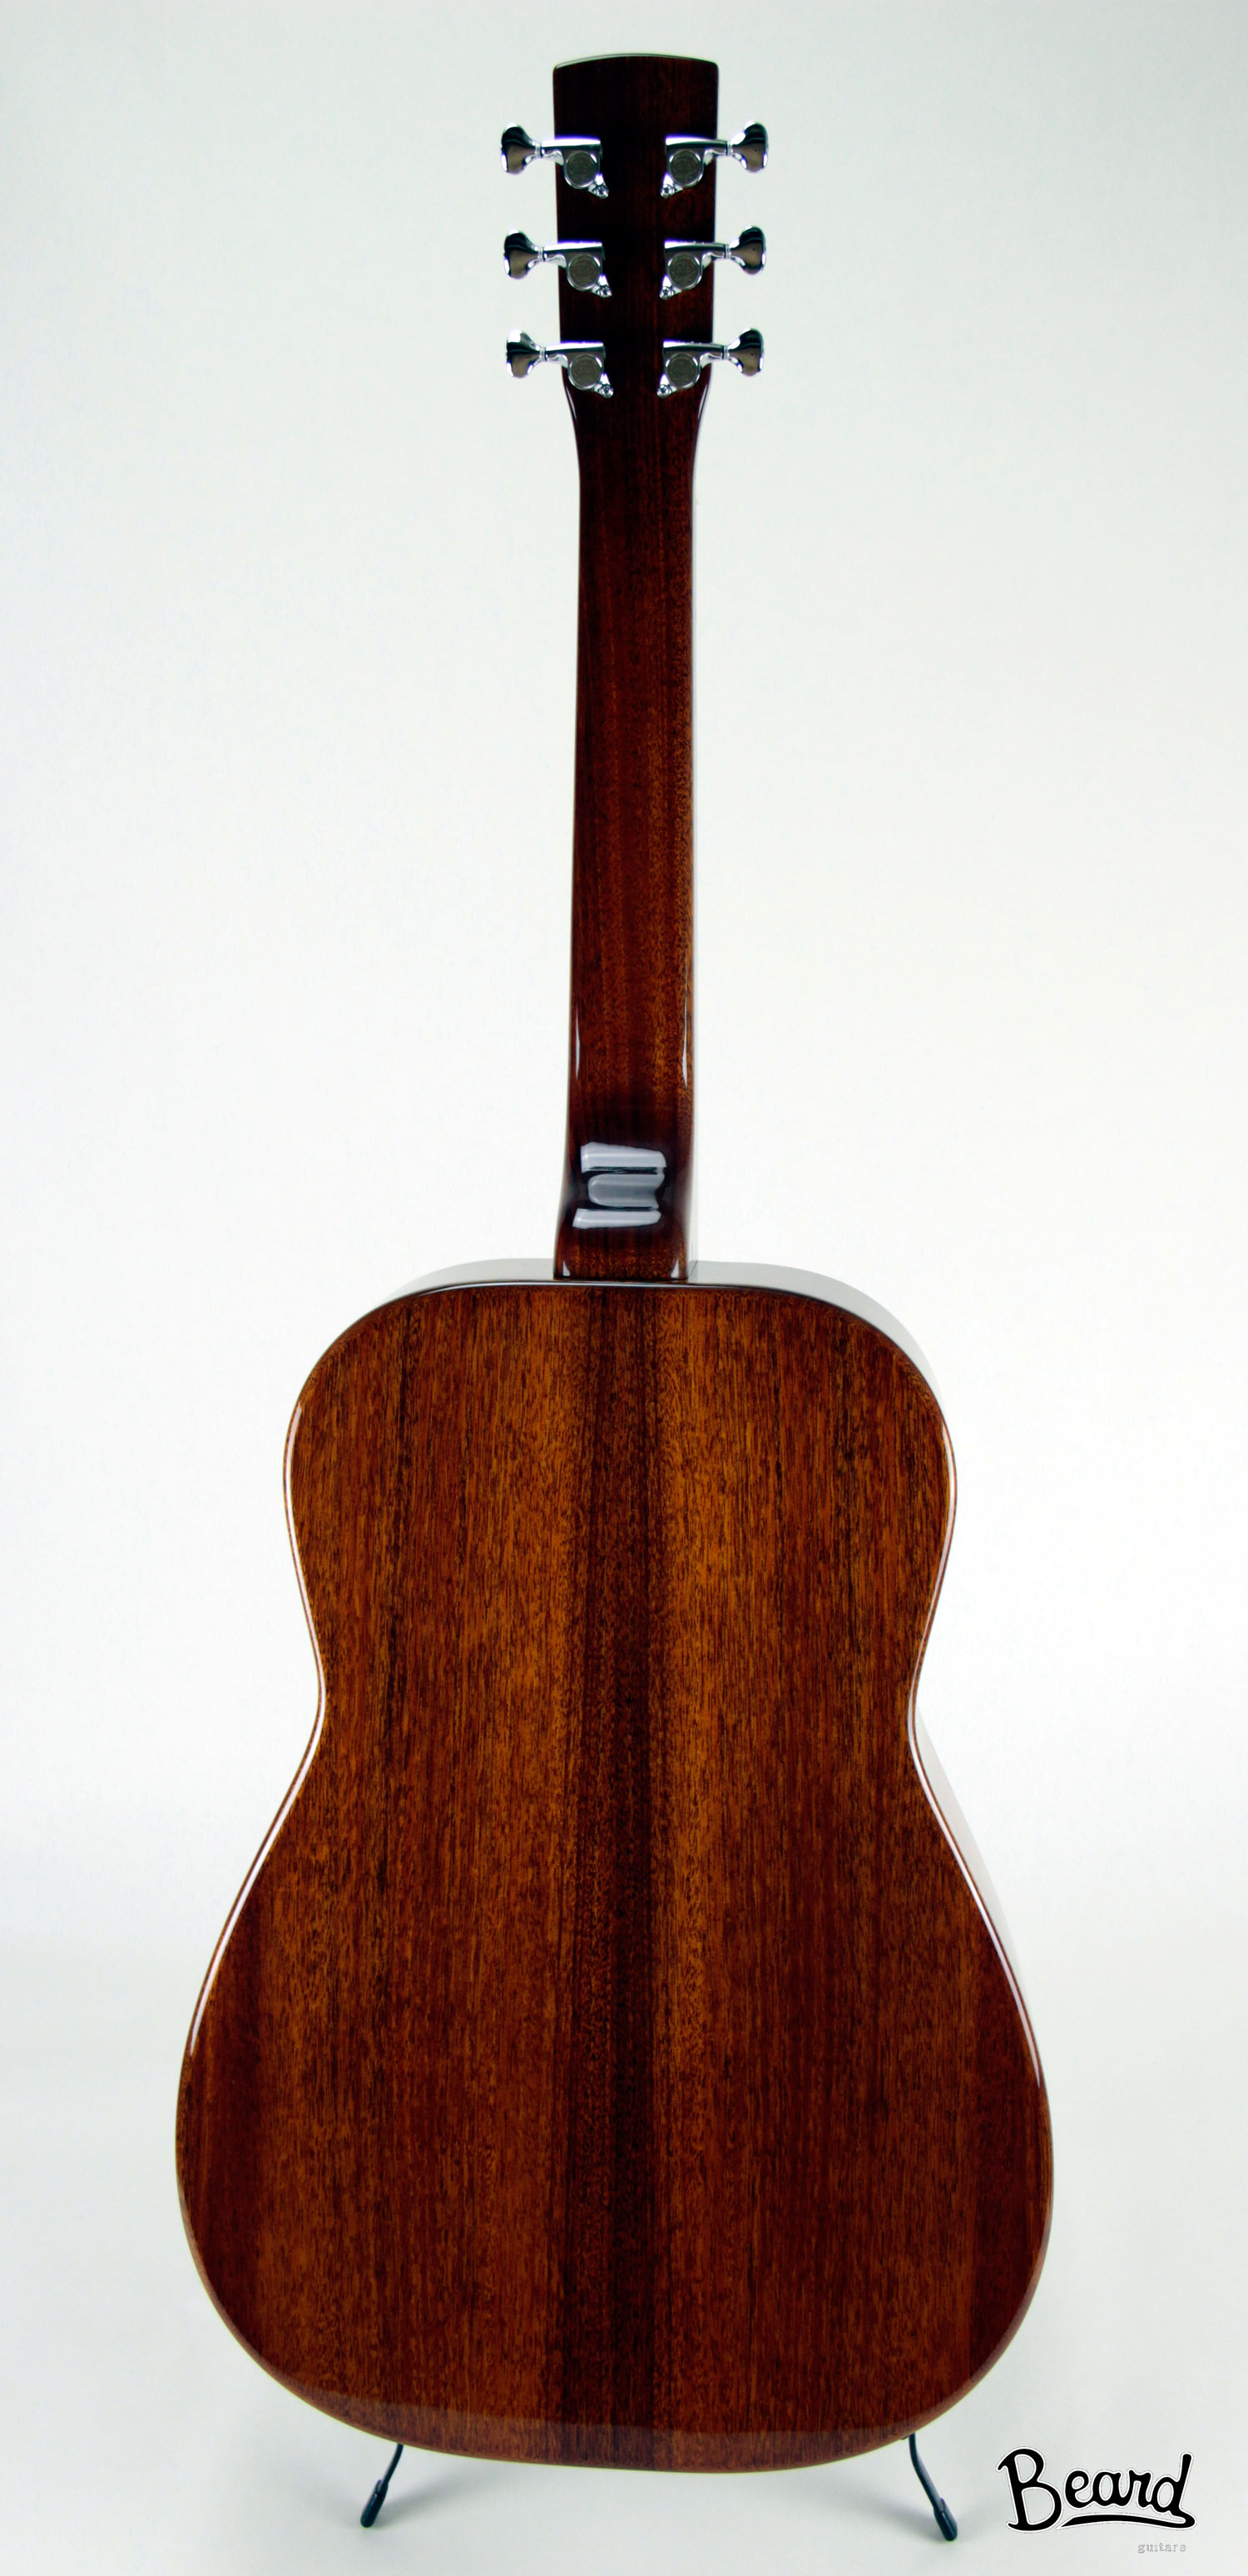 Belle-Beard-E-Odyssey-Nat-mahog-Custom-FB.jpg